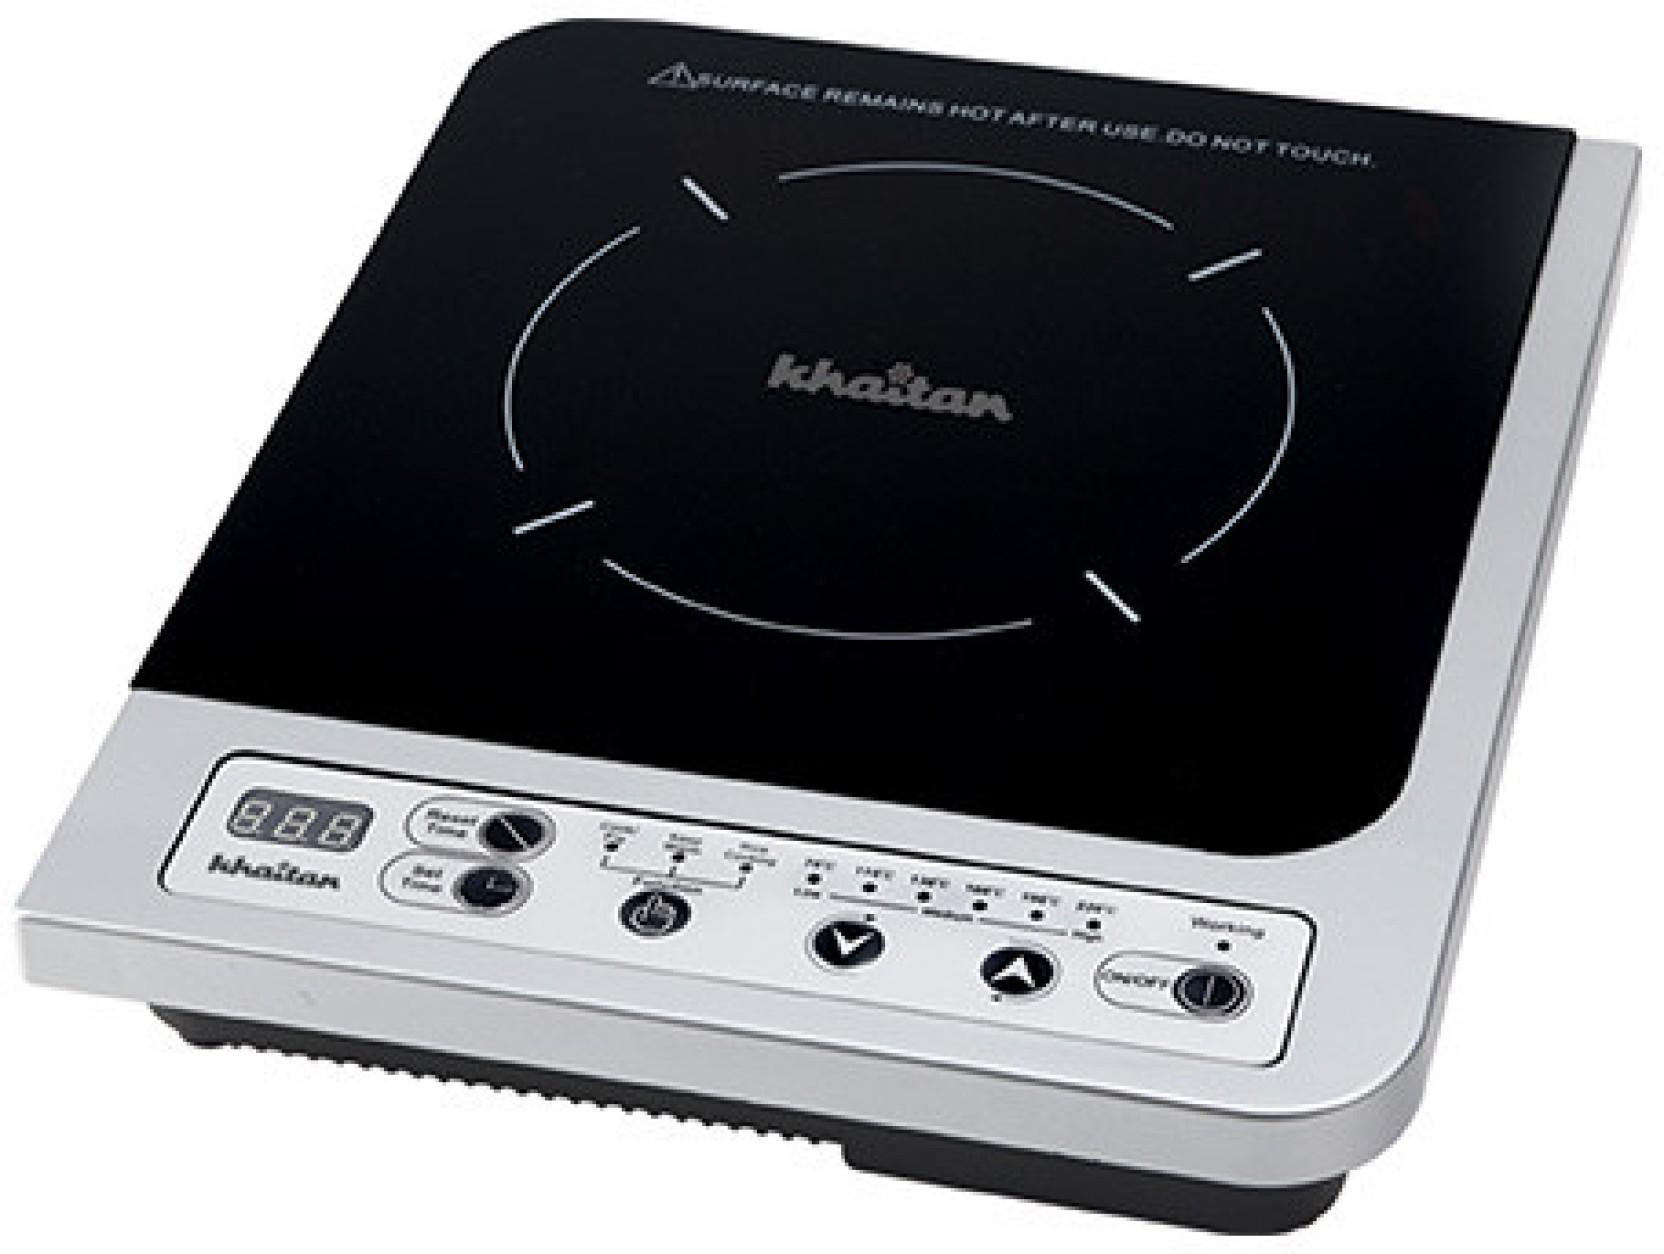 Khaitan Kic 401 Ad Induction Cooktop Buy Cooker Circuit Board N08 Bo Home